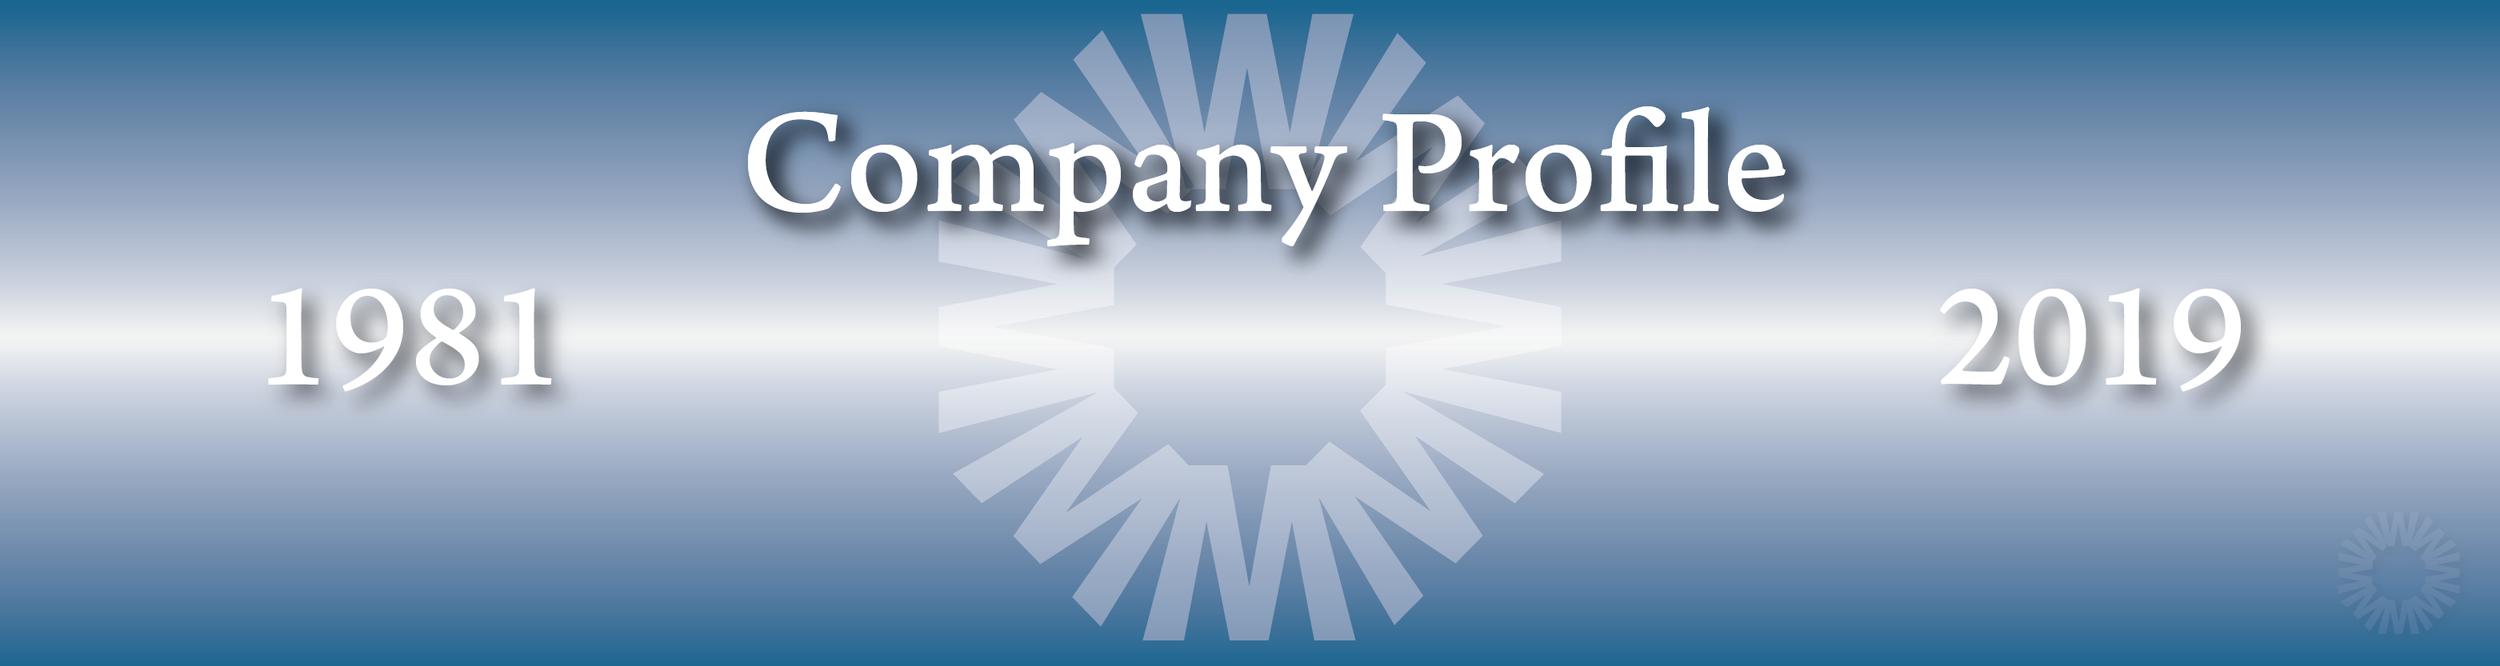 company-profile-header-150-2019.png